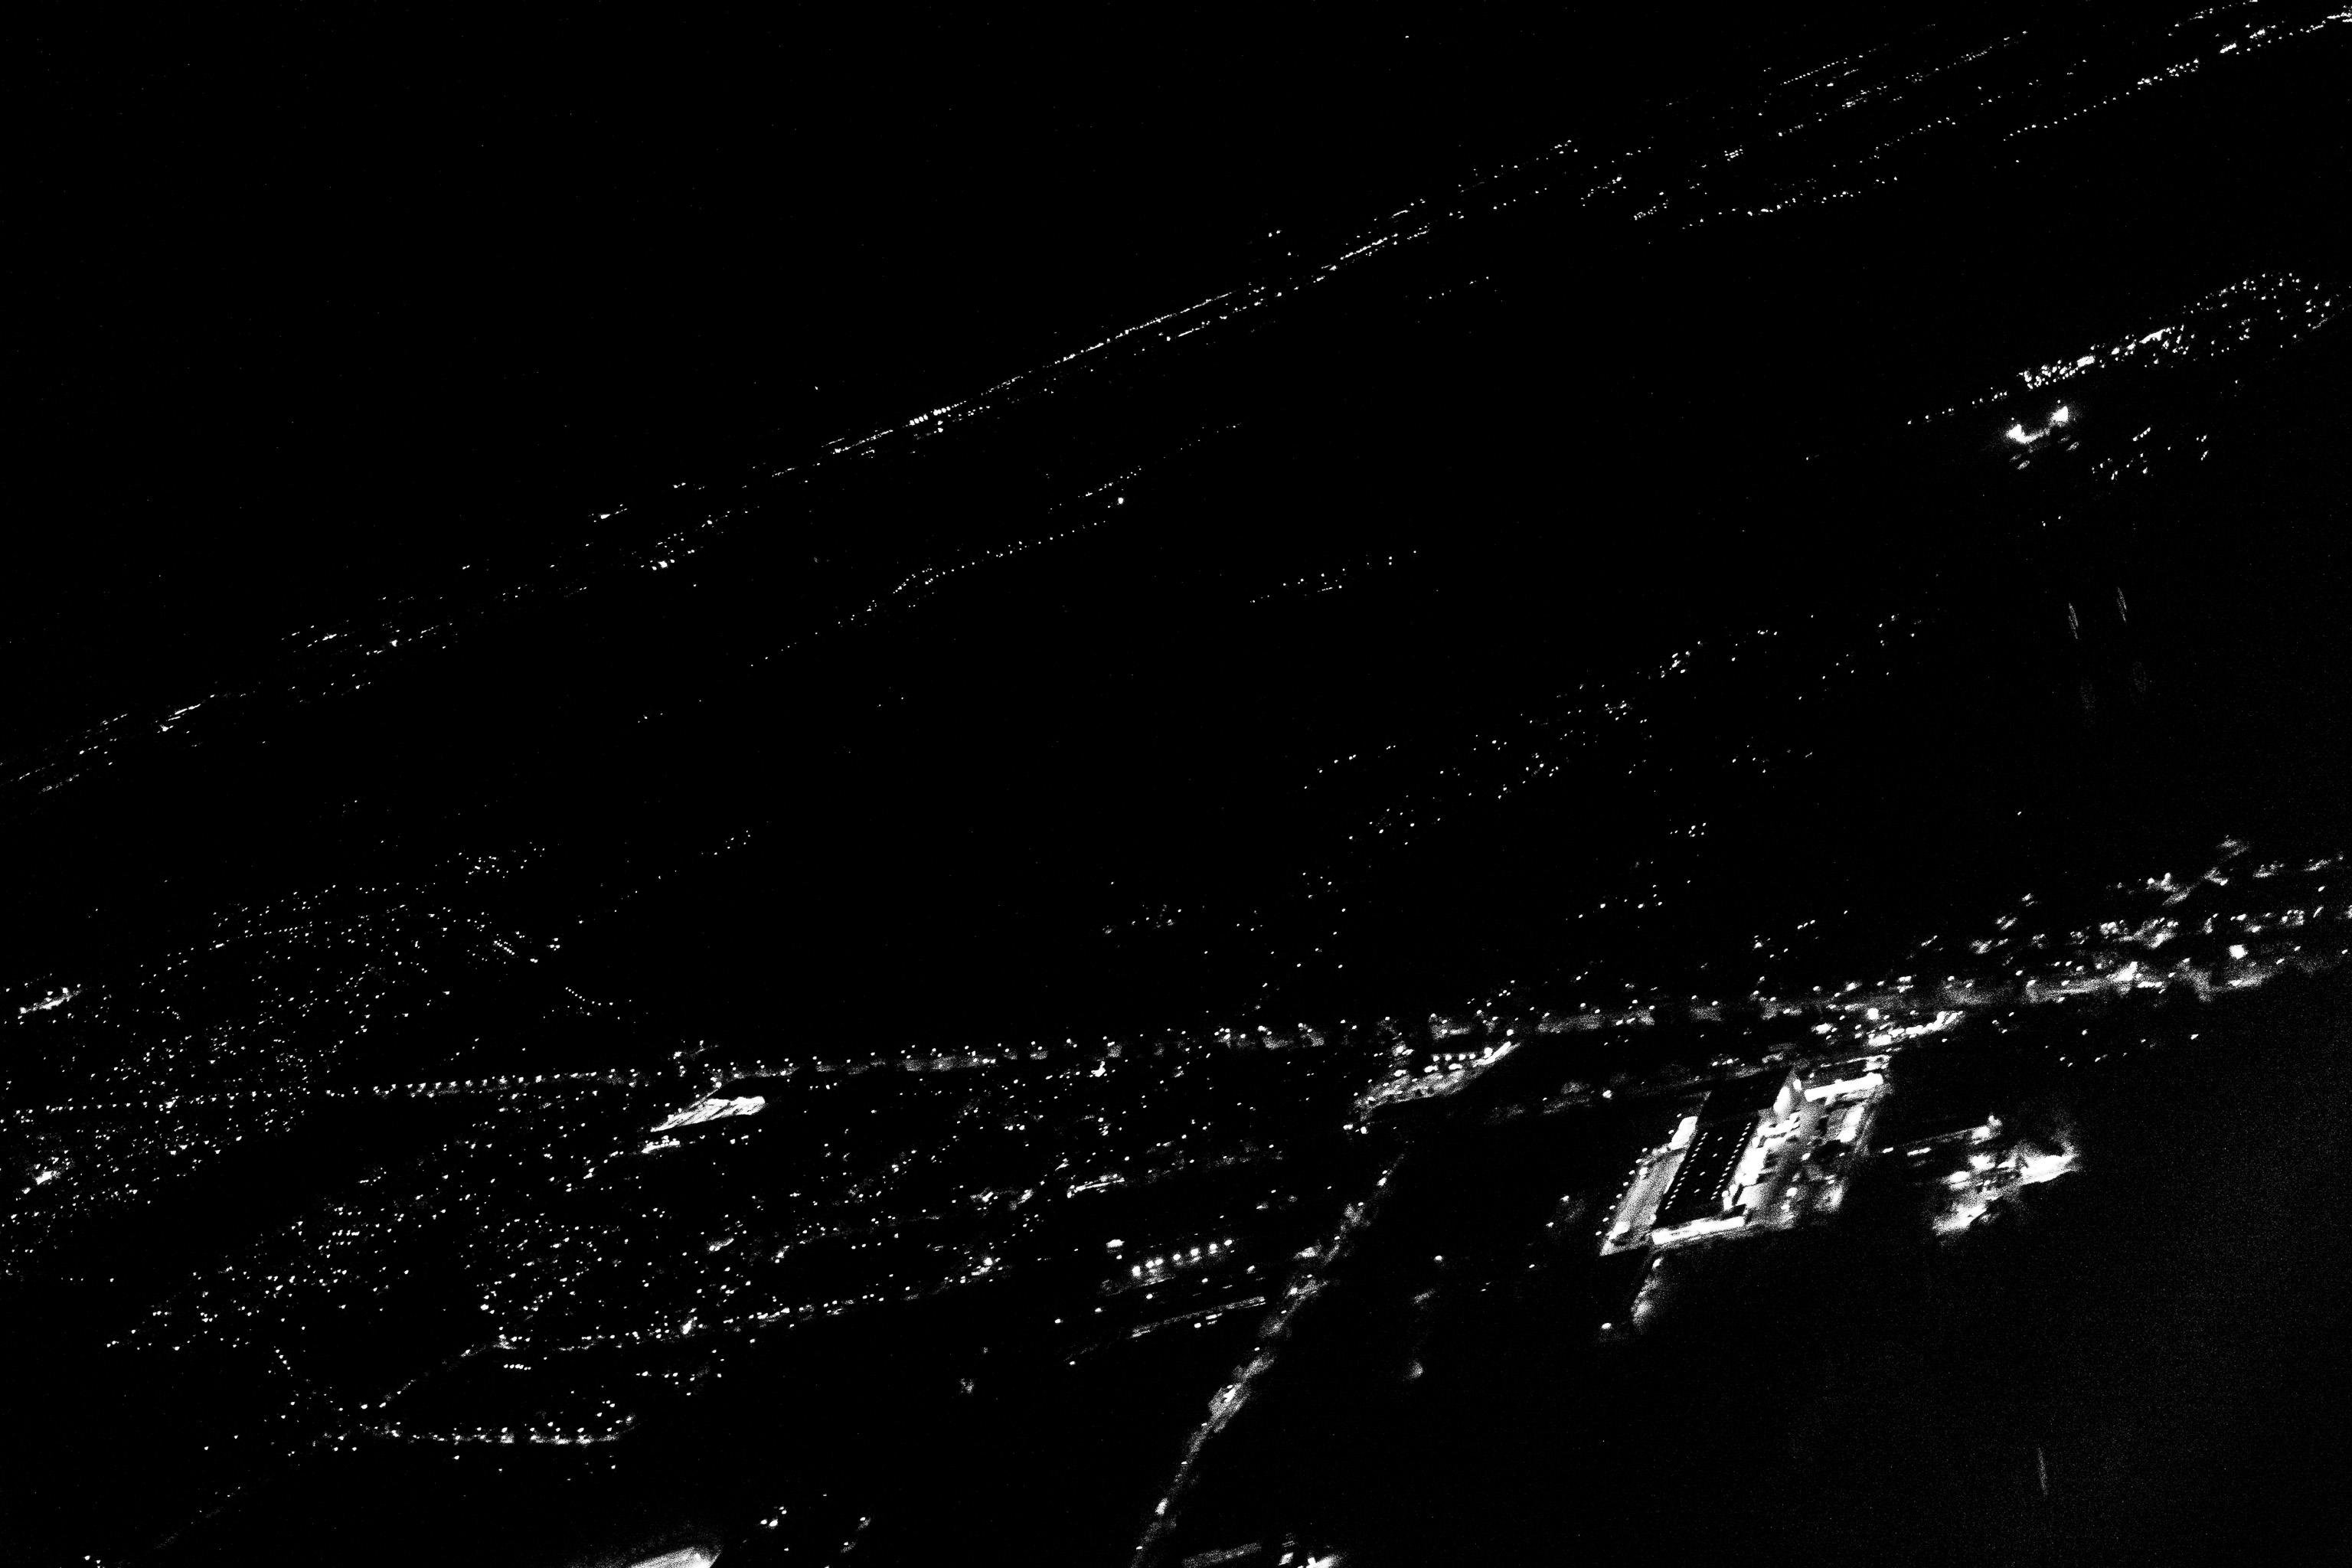 Vol de Nuit (14 von 16)